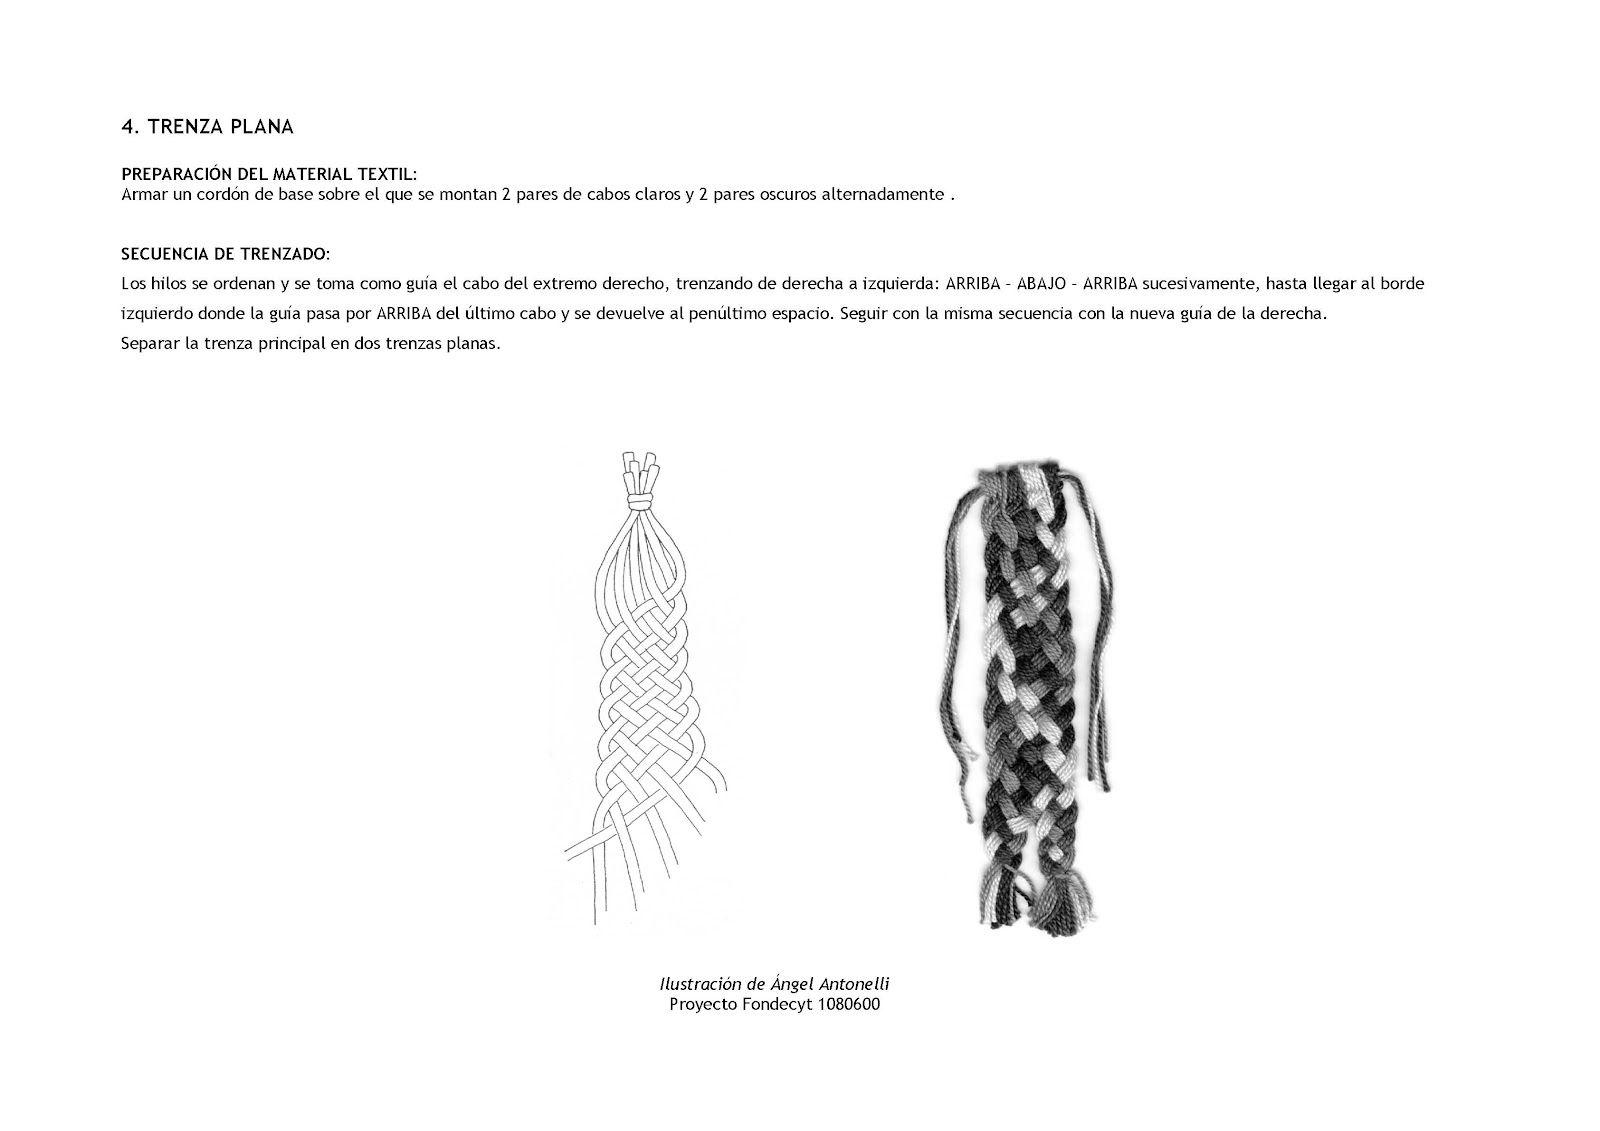 trenza plana | Wayuu | Pinterest | Trenza, Planos y Mi arte